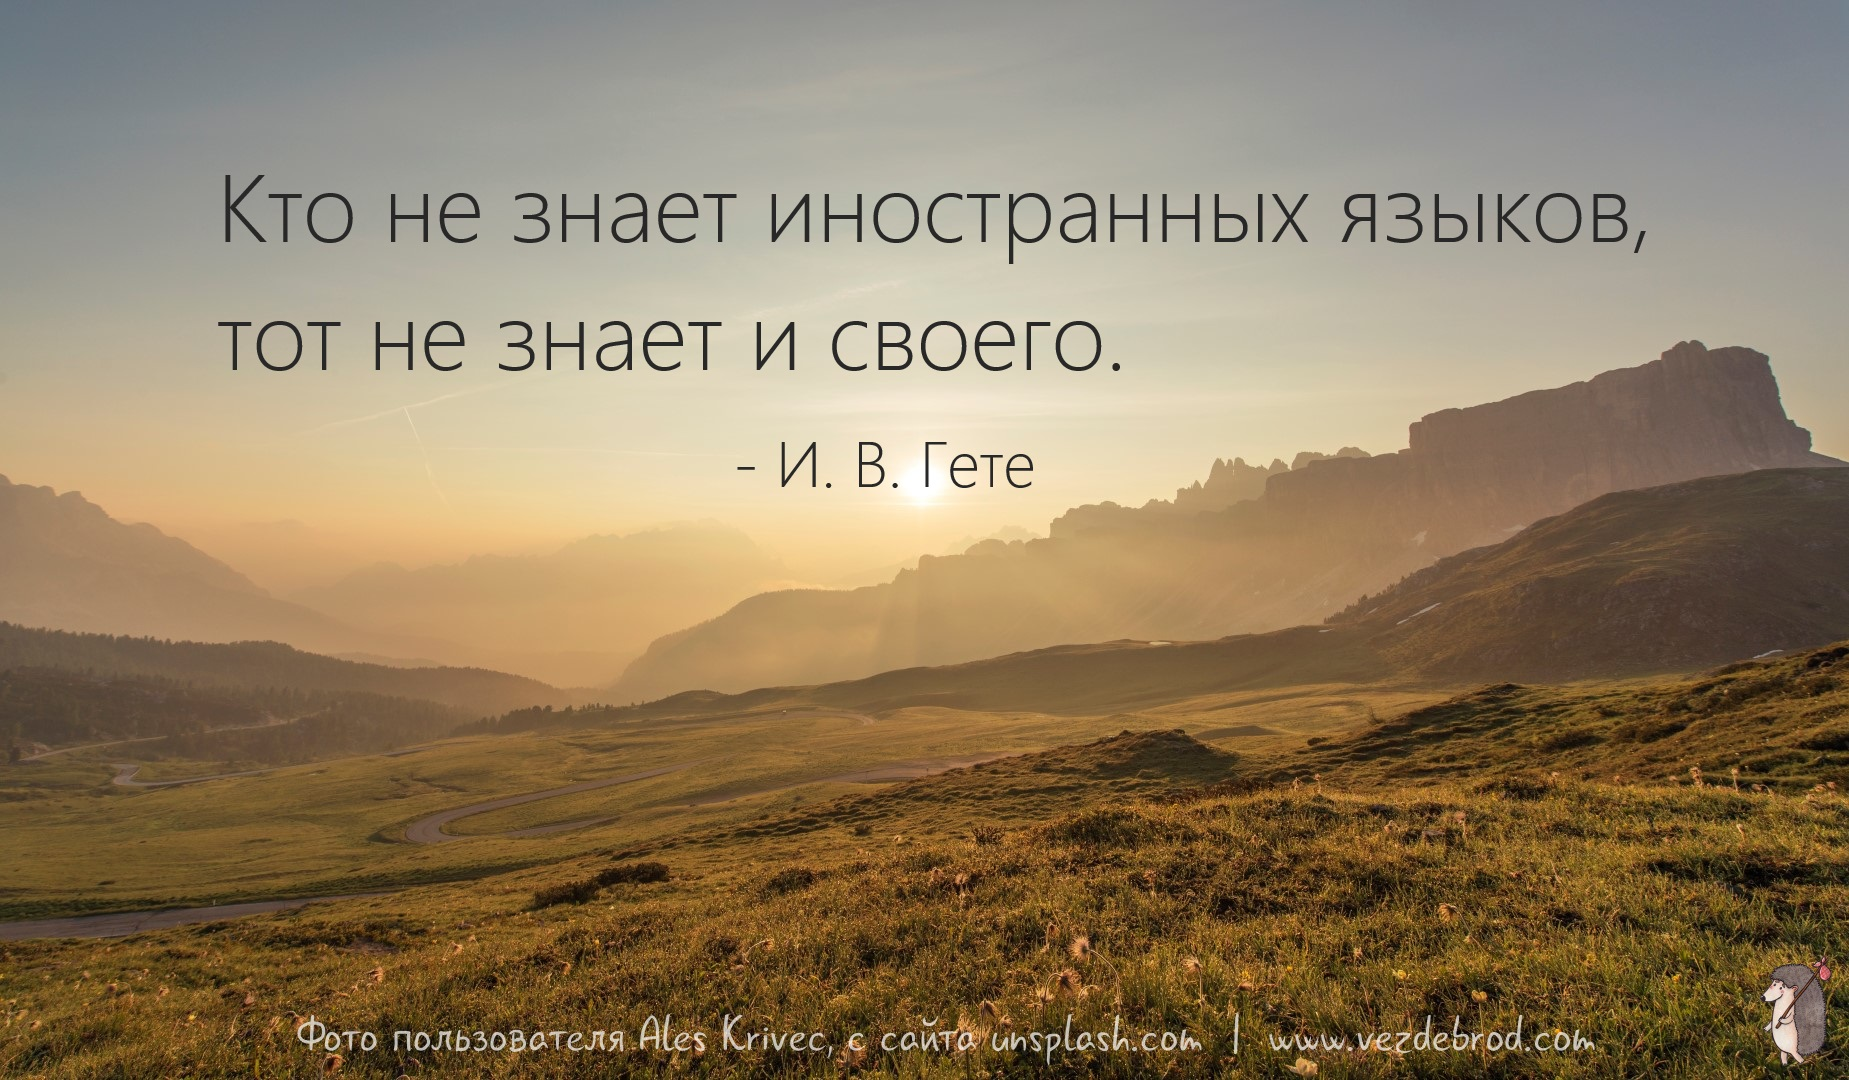 И. В. Гете